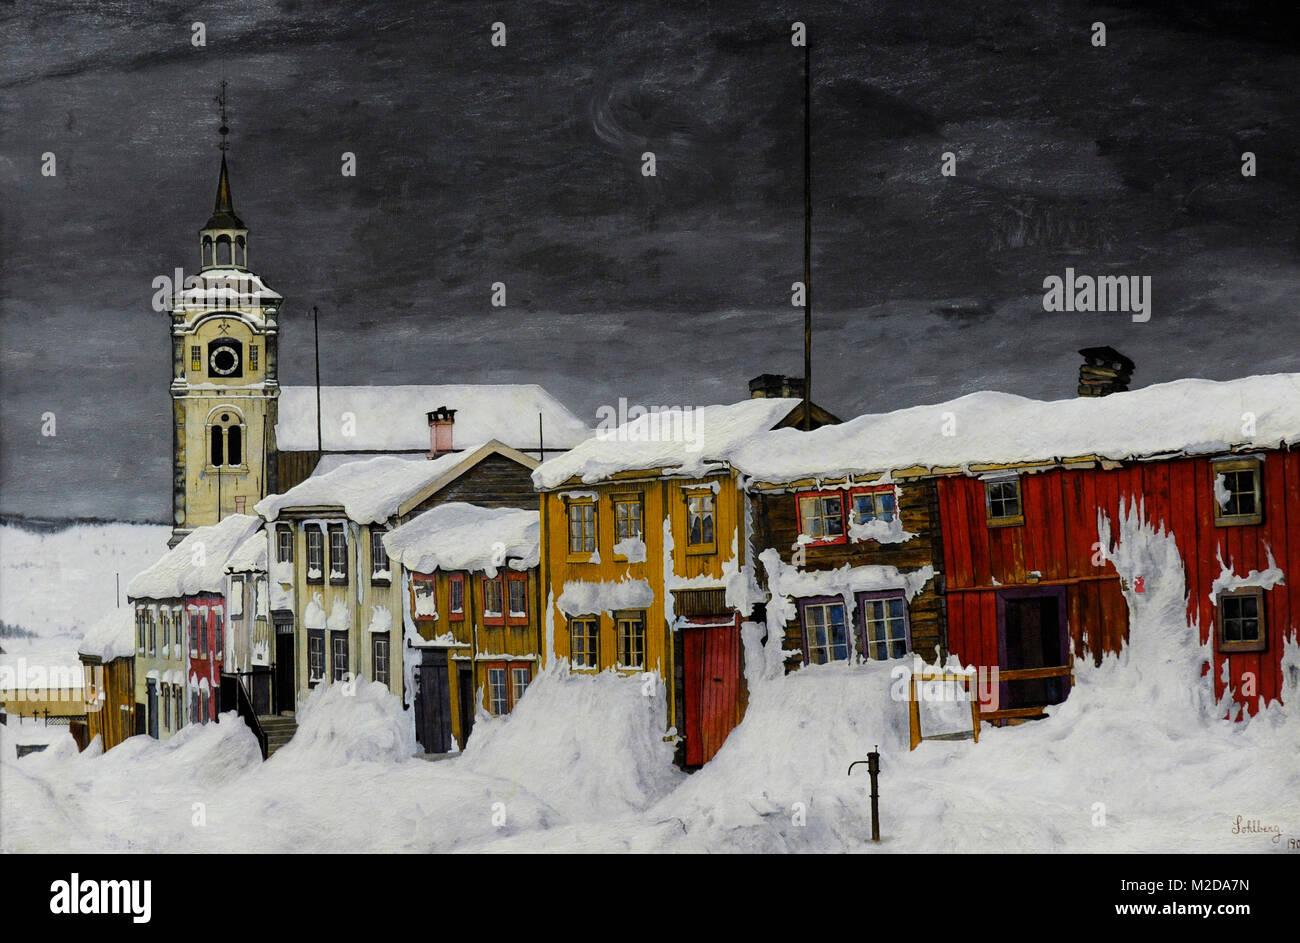 Harald Sohlberg (1869-1935). Norwegian painter. Street in Roros in Winter, 1903. National Gallery. Oslo. Norway. - Stock Image